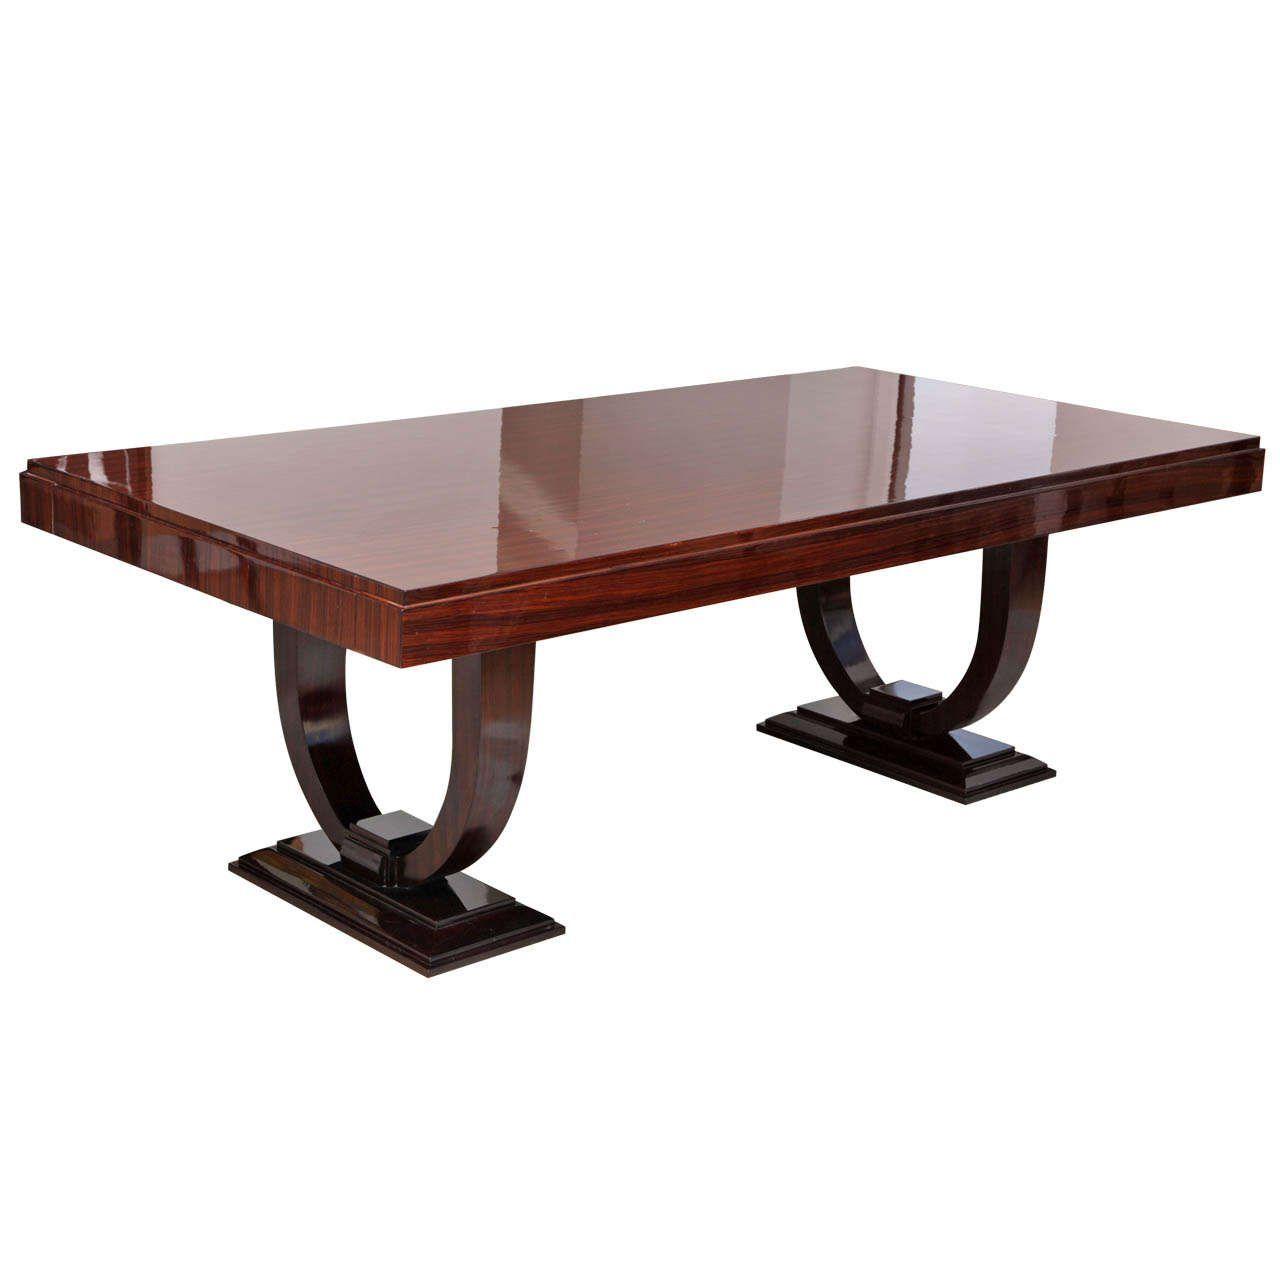 Stunning Art Deco Macassar Ebony Dining Table Dining Table Art